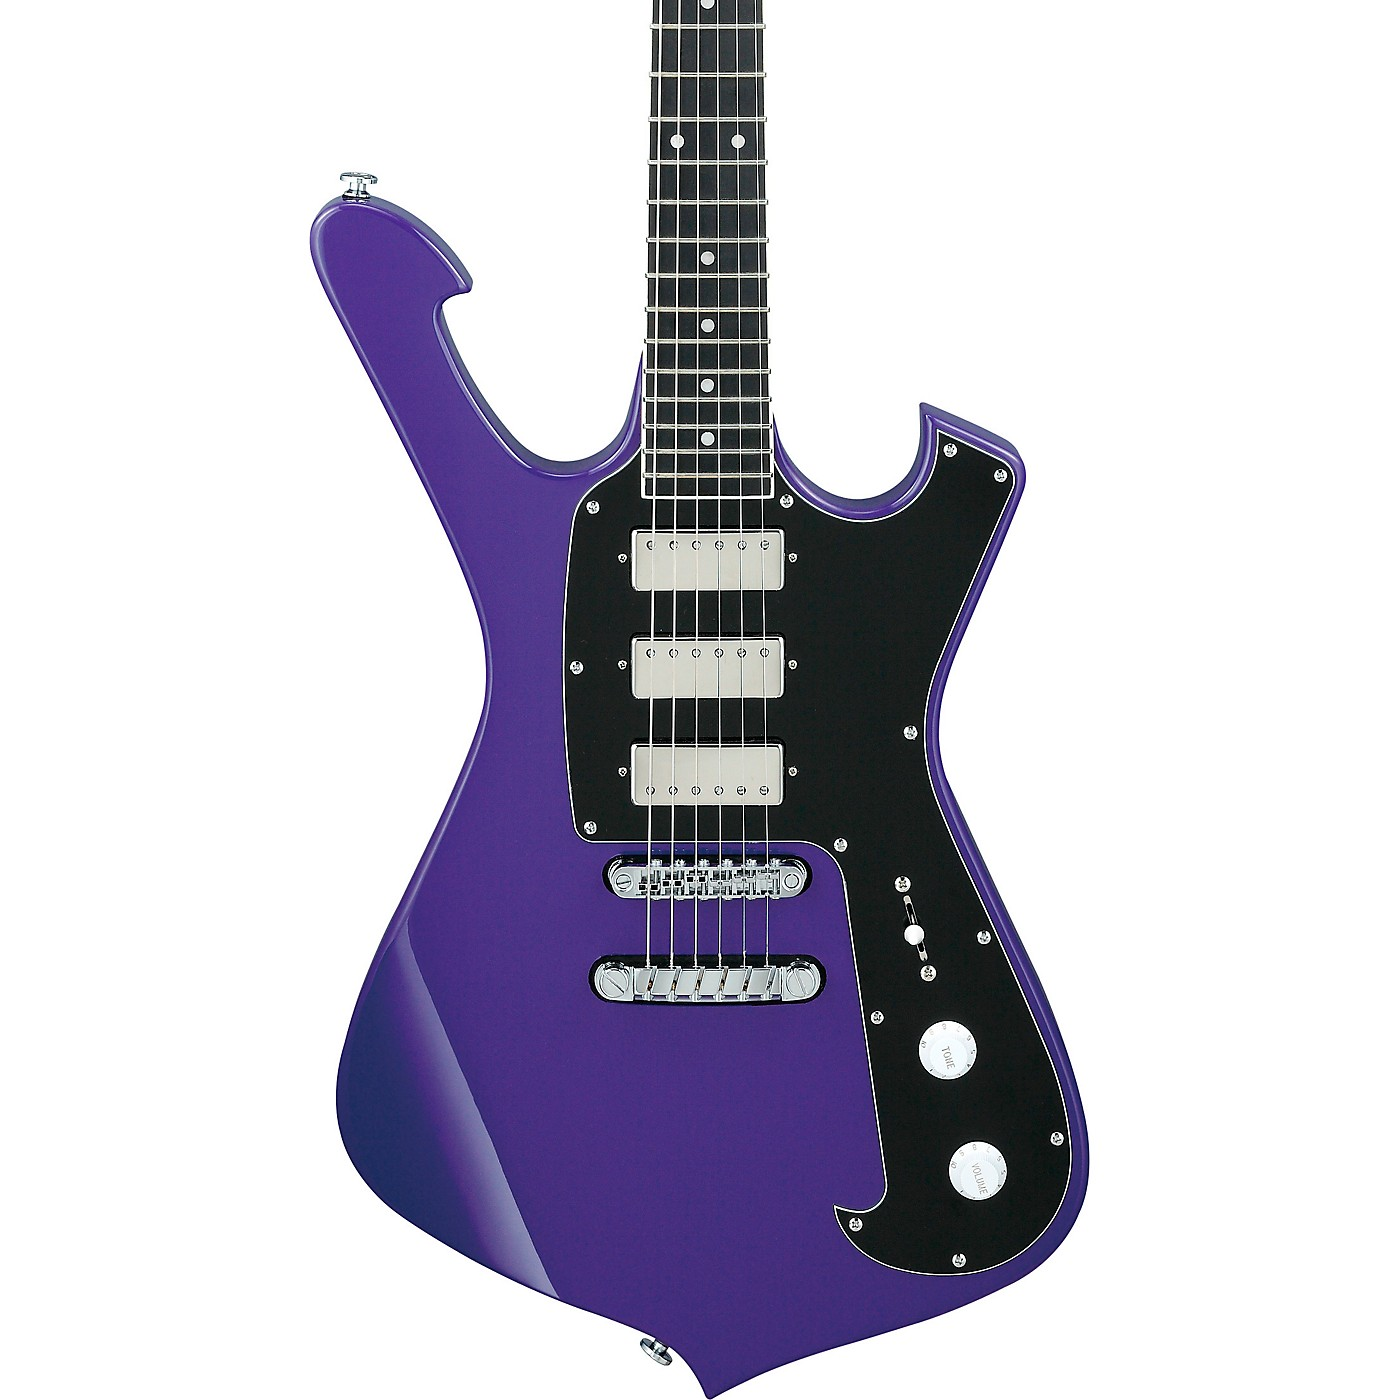 Ibanez FRM300 Paul Gilbert Signature Moldel 6str Electric Guitar thumbnail